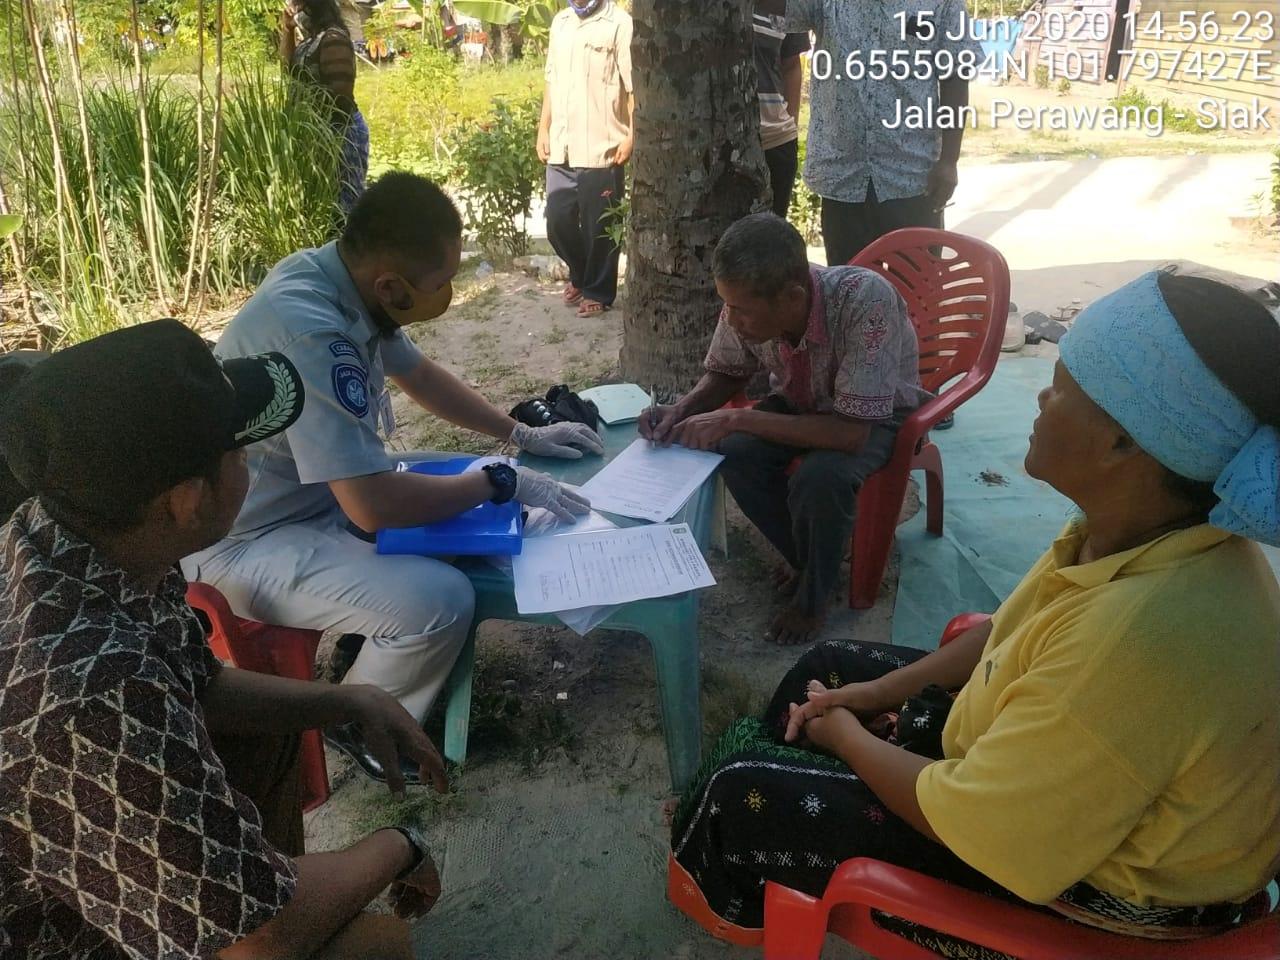 Dalam Hitungan Jam, Petugas Jasa Raharja Riau Serahkan Santunan Korban Laka Lantas di Kabupaten Siak